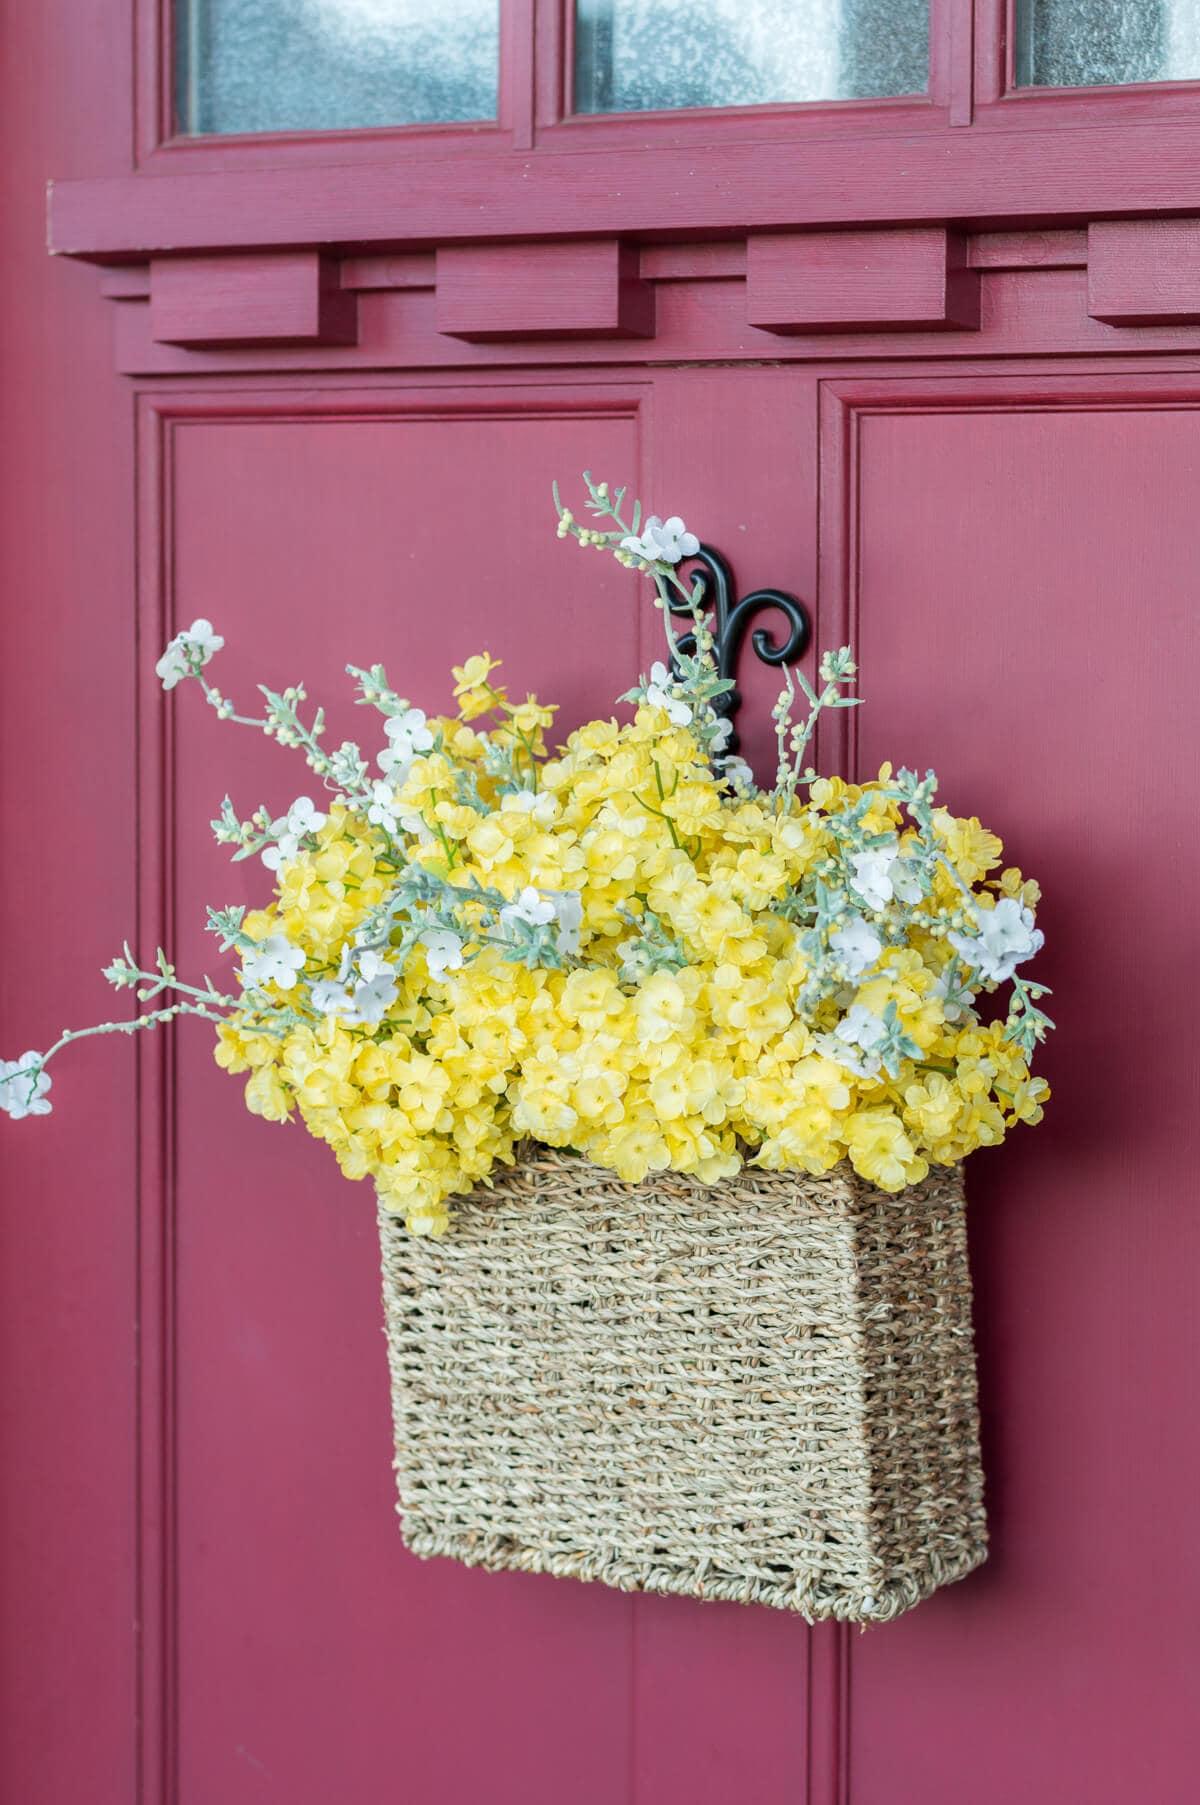 5 Minute Diy Spring Flower Door Basket Video The Home I Create